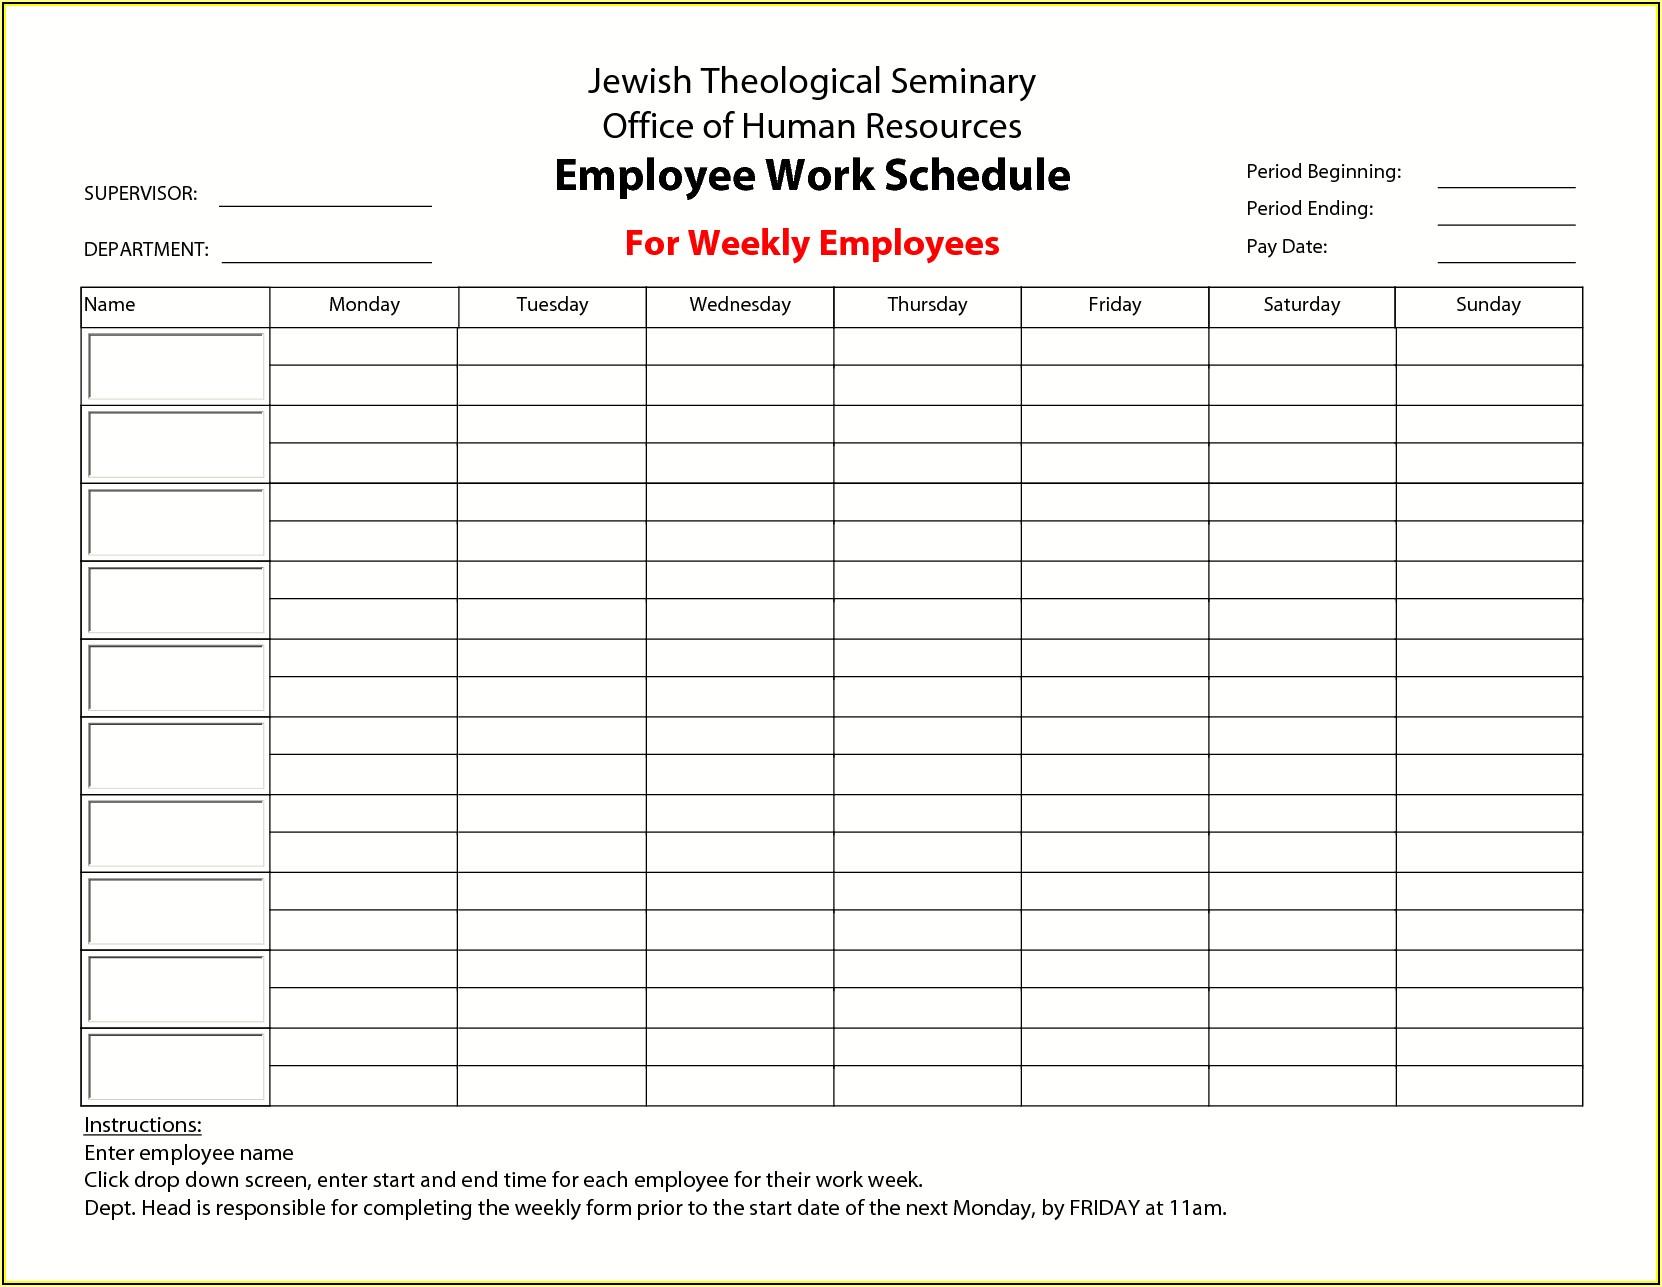 Monthly Employee Work Schedule Template